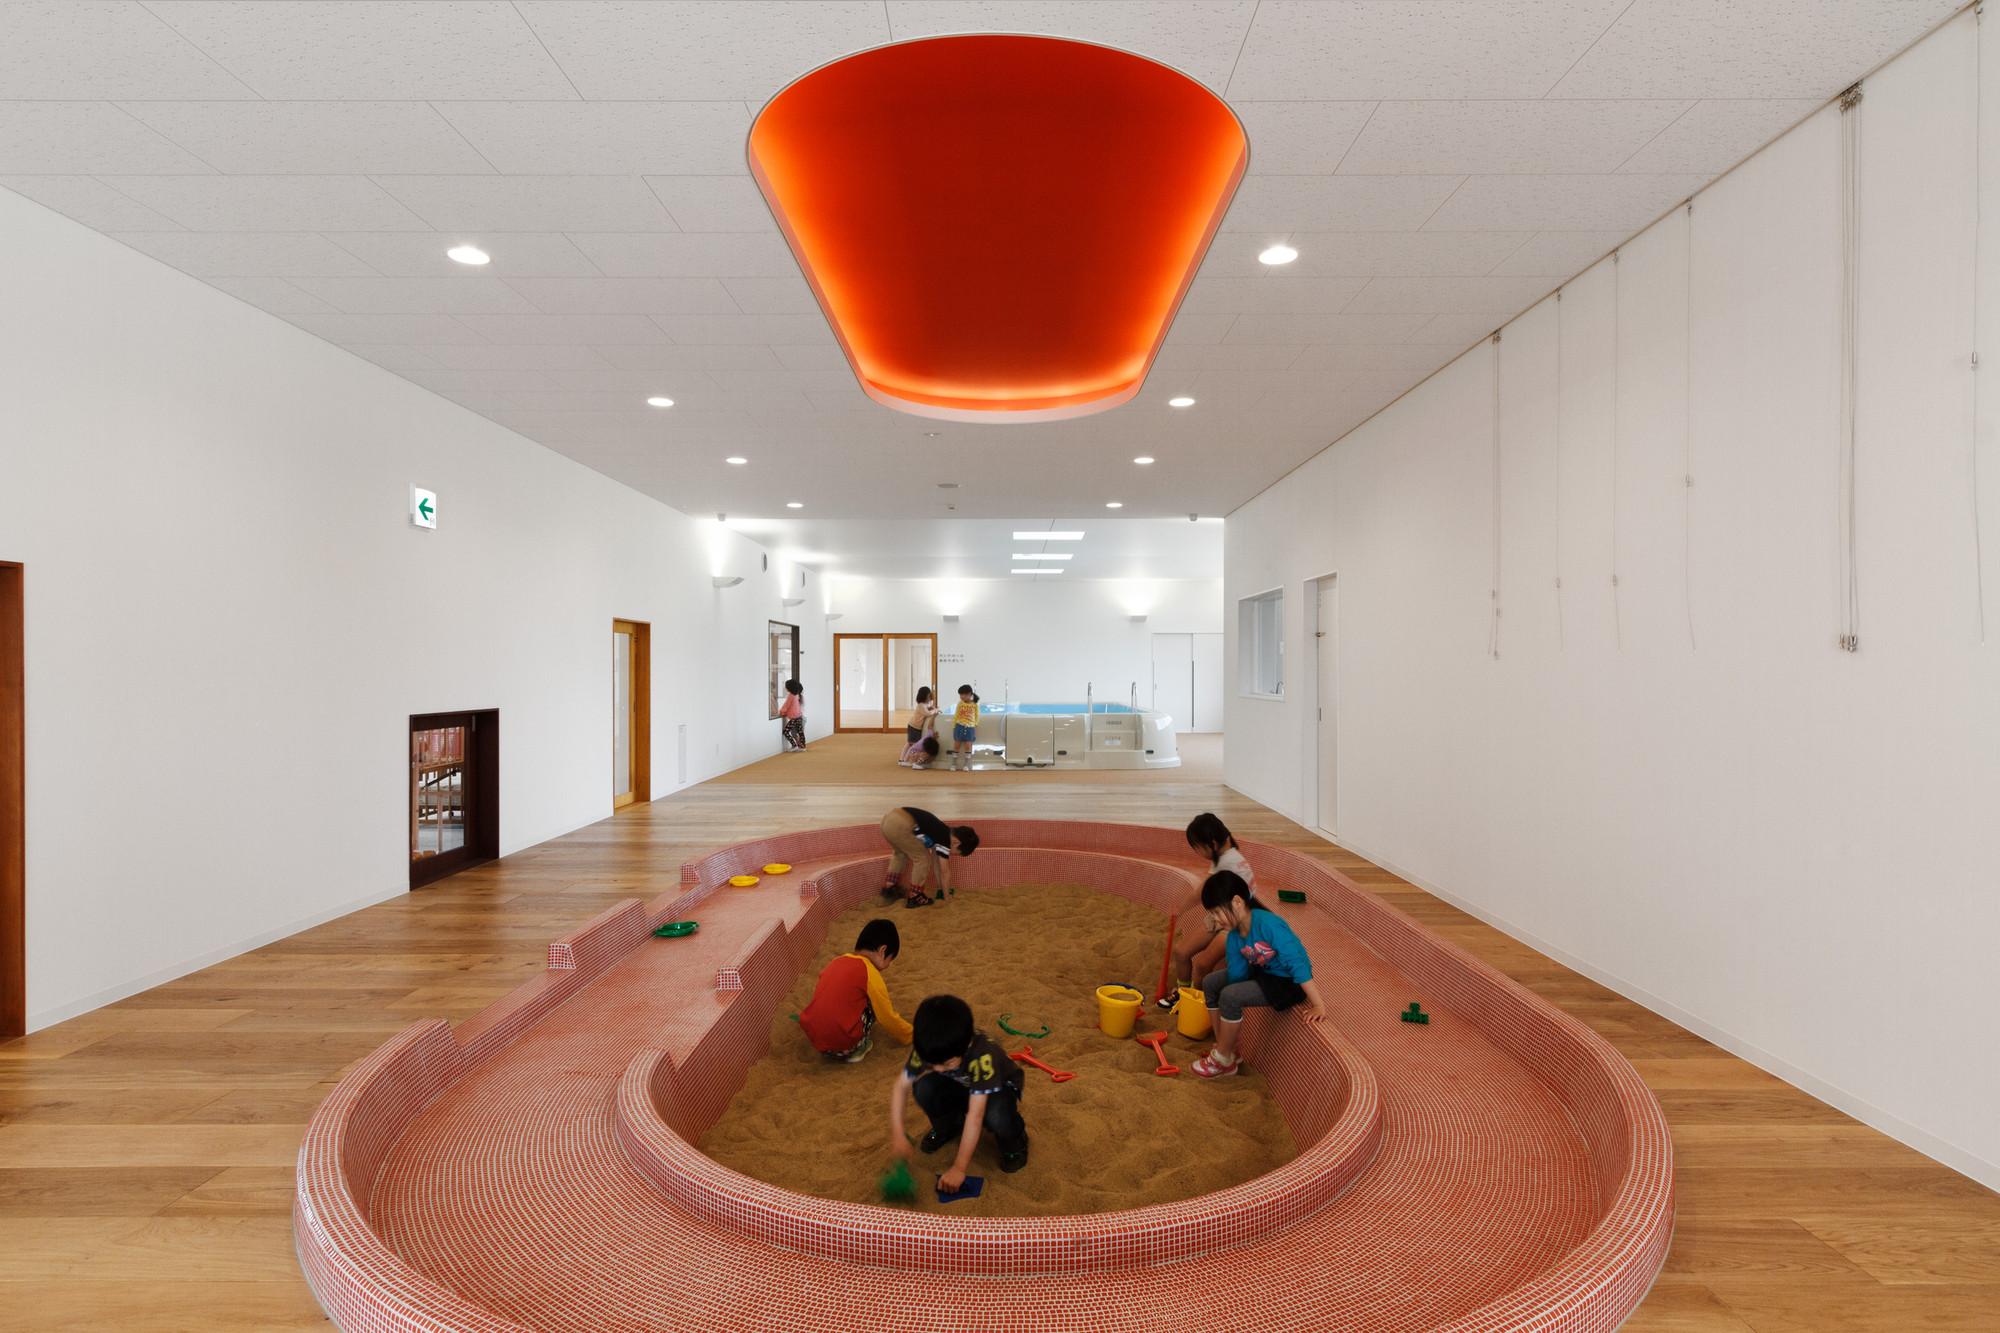 SP Nursery / HIBINOSEKKEI + Youji no Shiro, © Studio Bauhaus, Ryuji Inoue